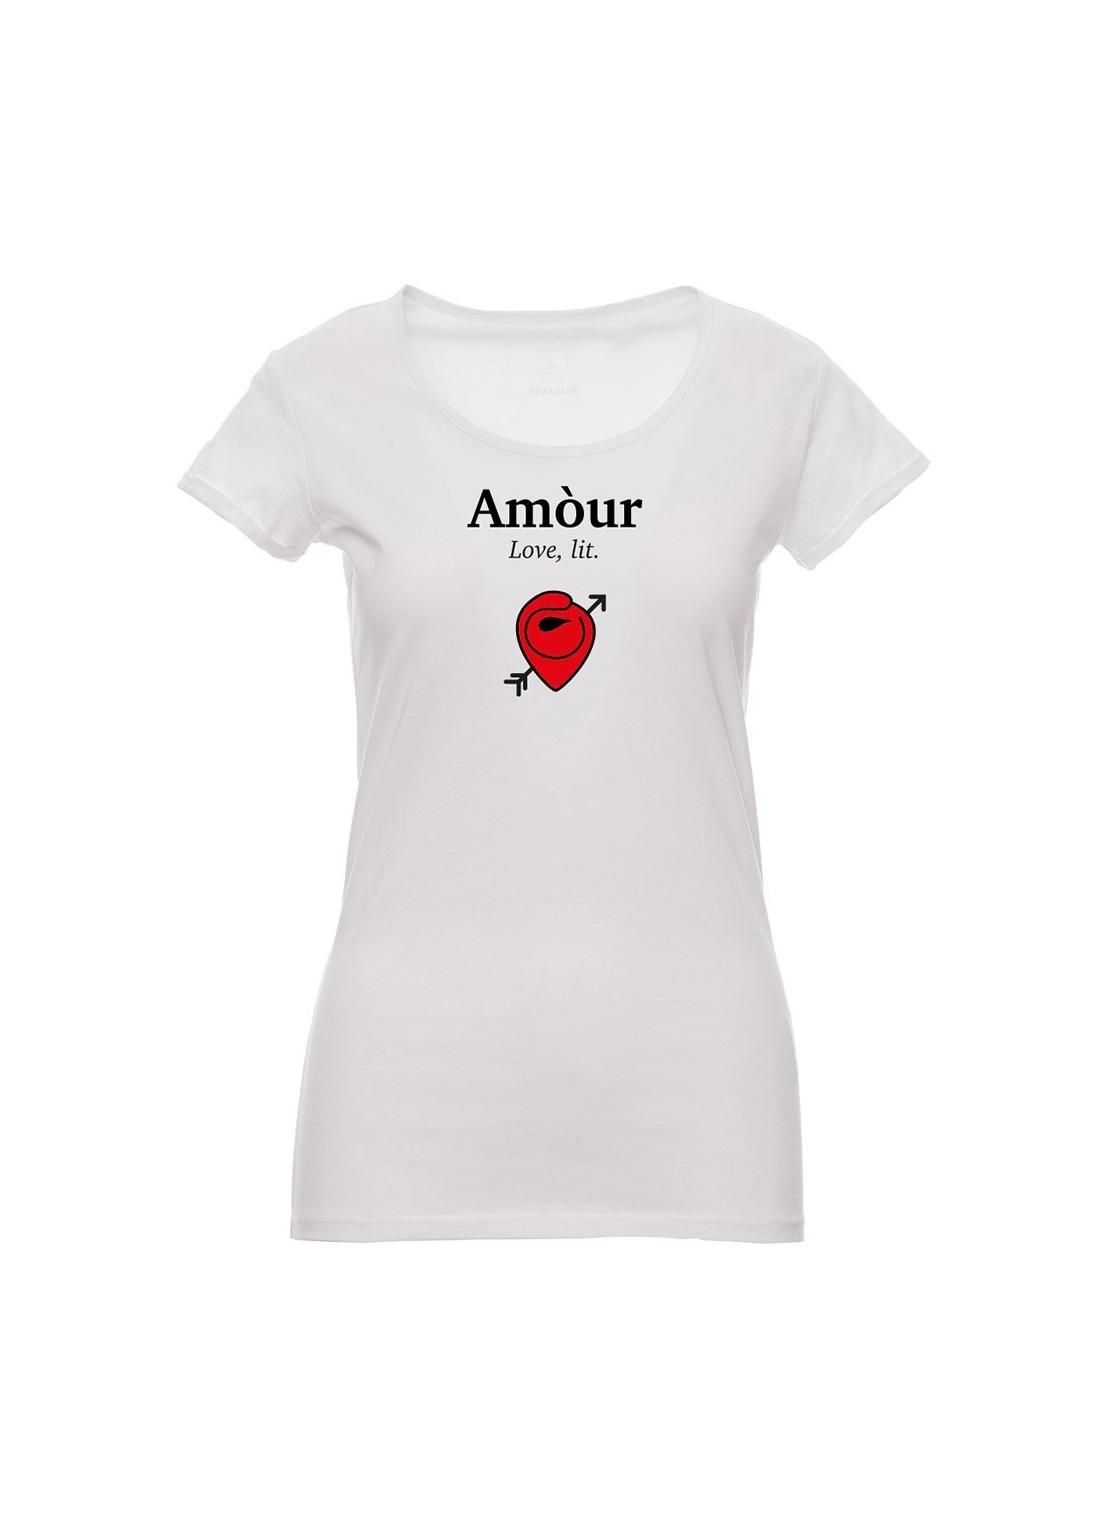 t-shirt cornucuore nera - unisex